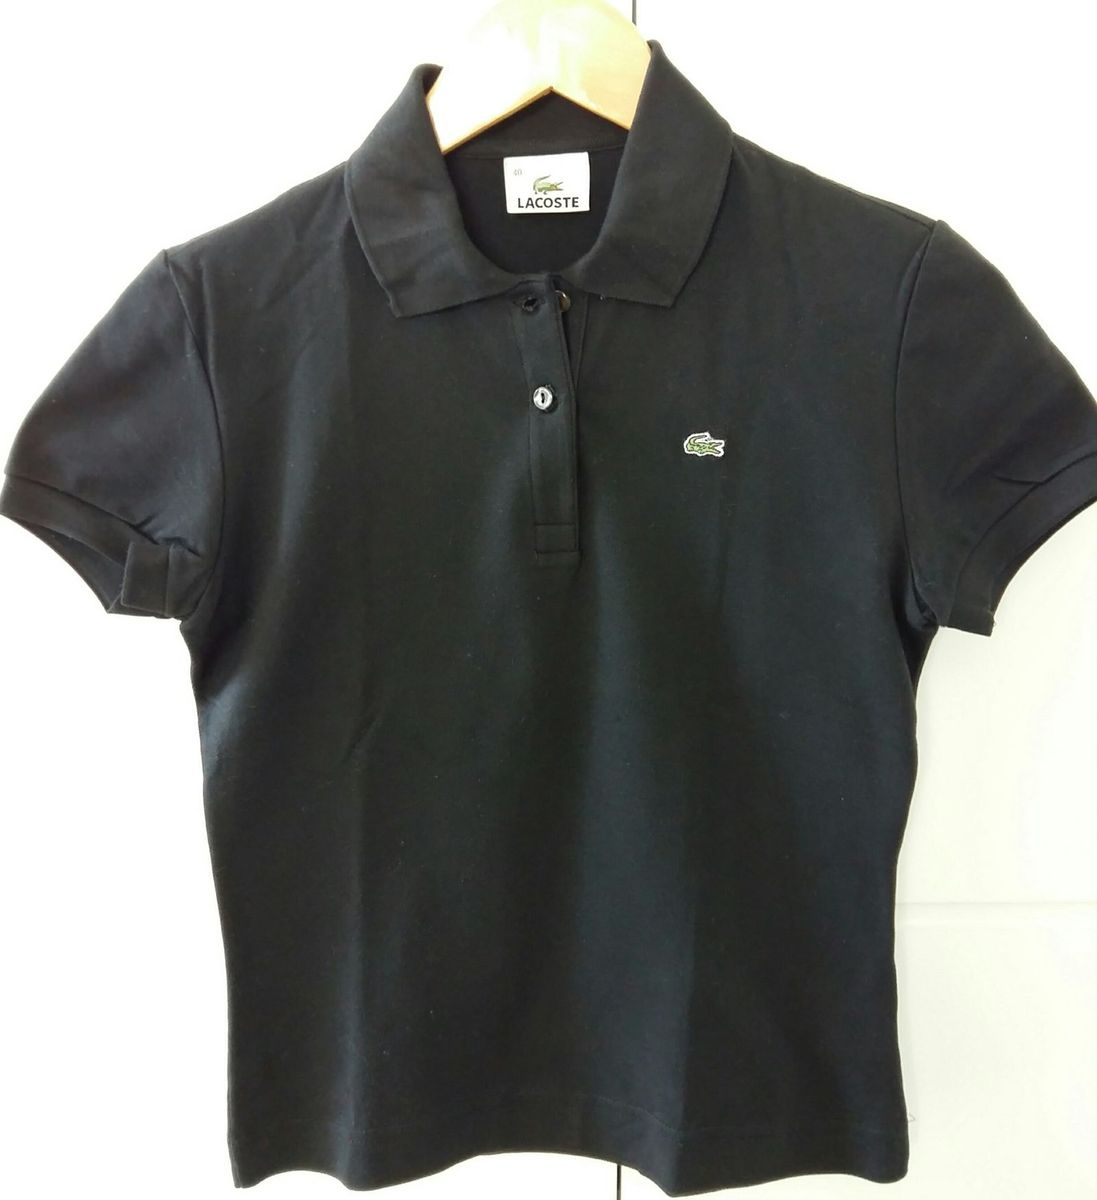 a30215e94495c camisa polo lacoste original - camisas lacoste.  Czm6ly9wag90b3muzw5qb2vplmnvbs5ici9wcm9kdwn0cy85mtk0njkvymm5ytq0ntnintblnzjhotrlzda2zmeyymzjmzkxzgyuanbn  ...